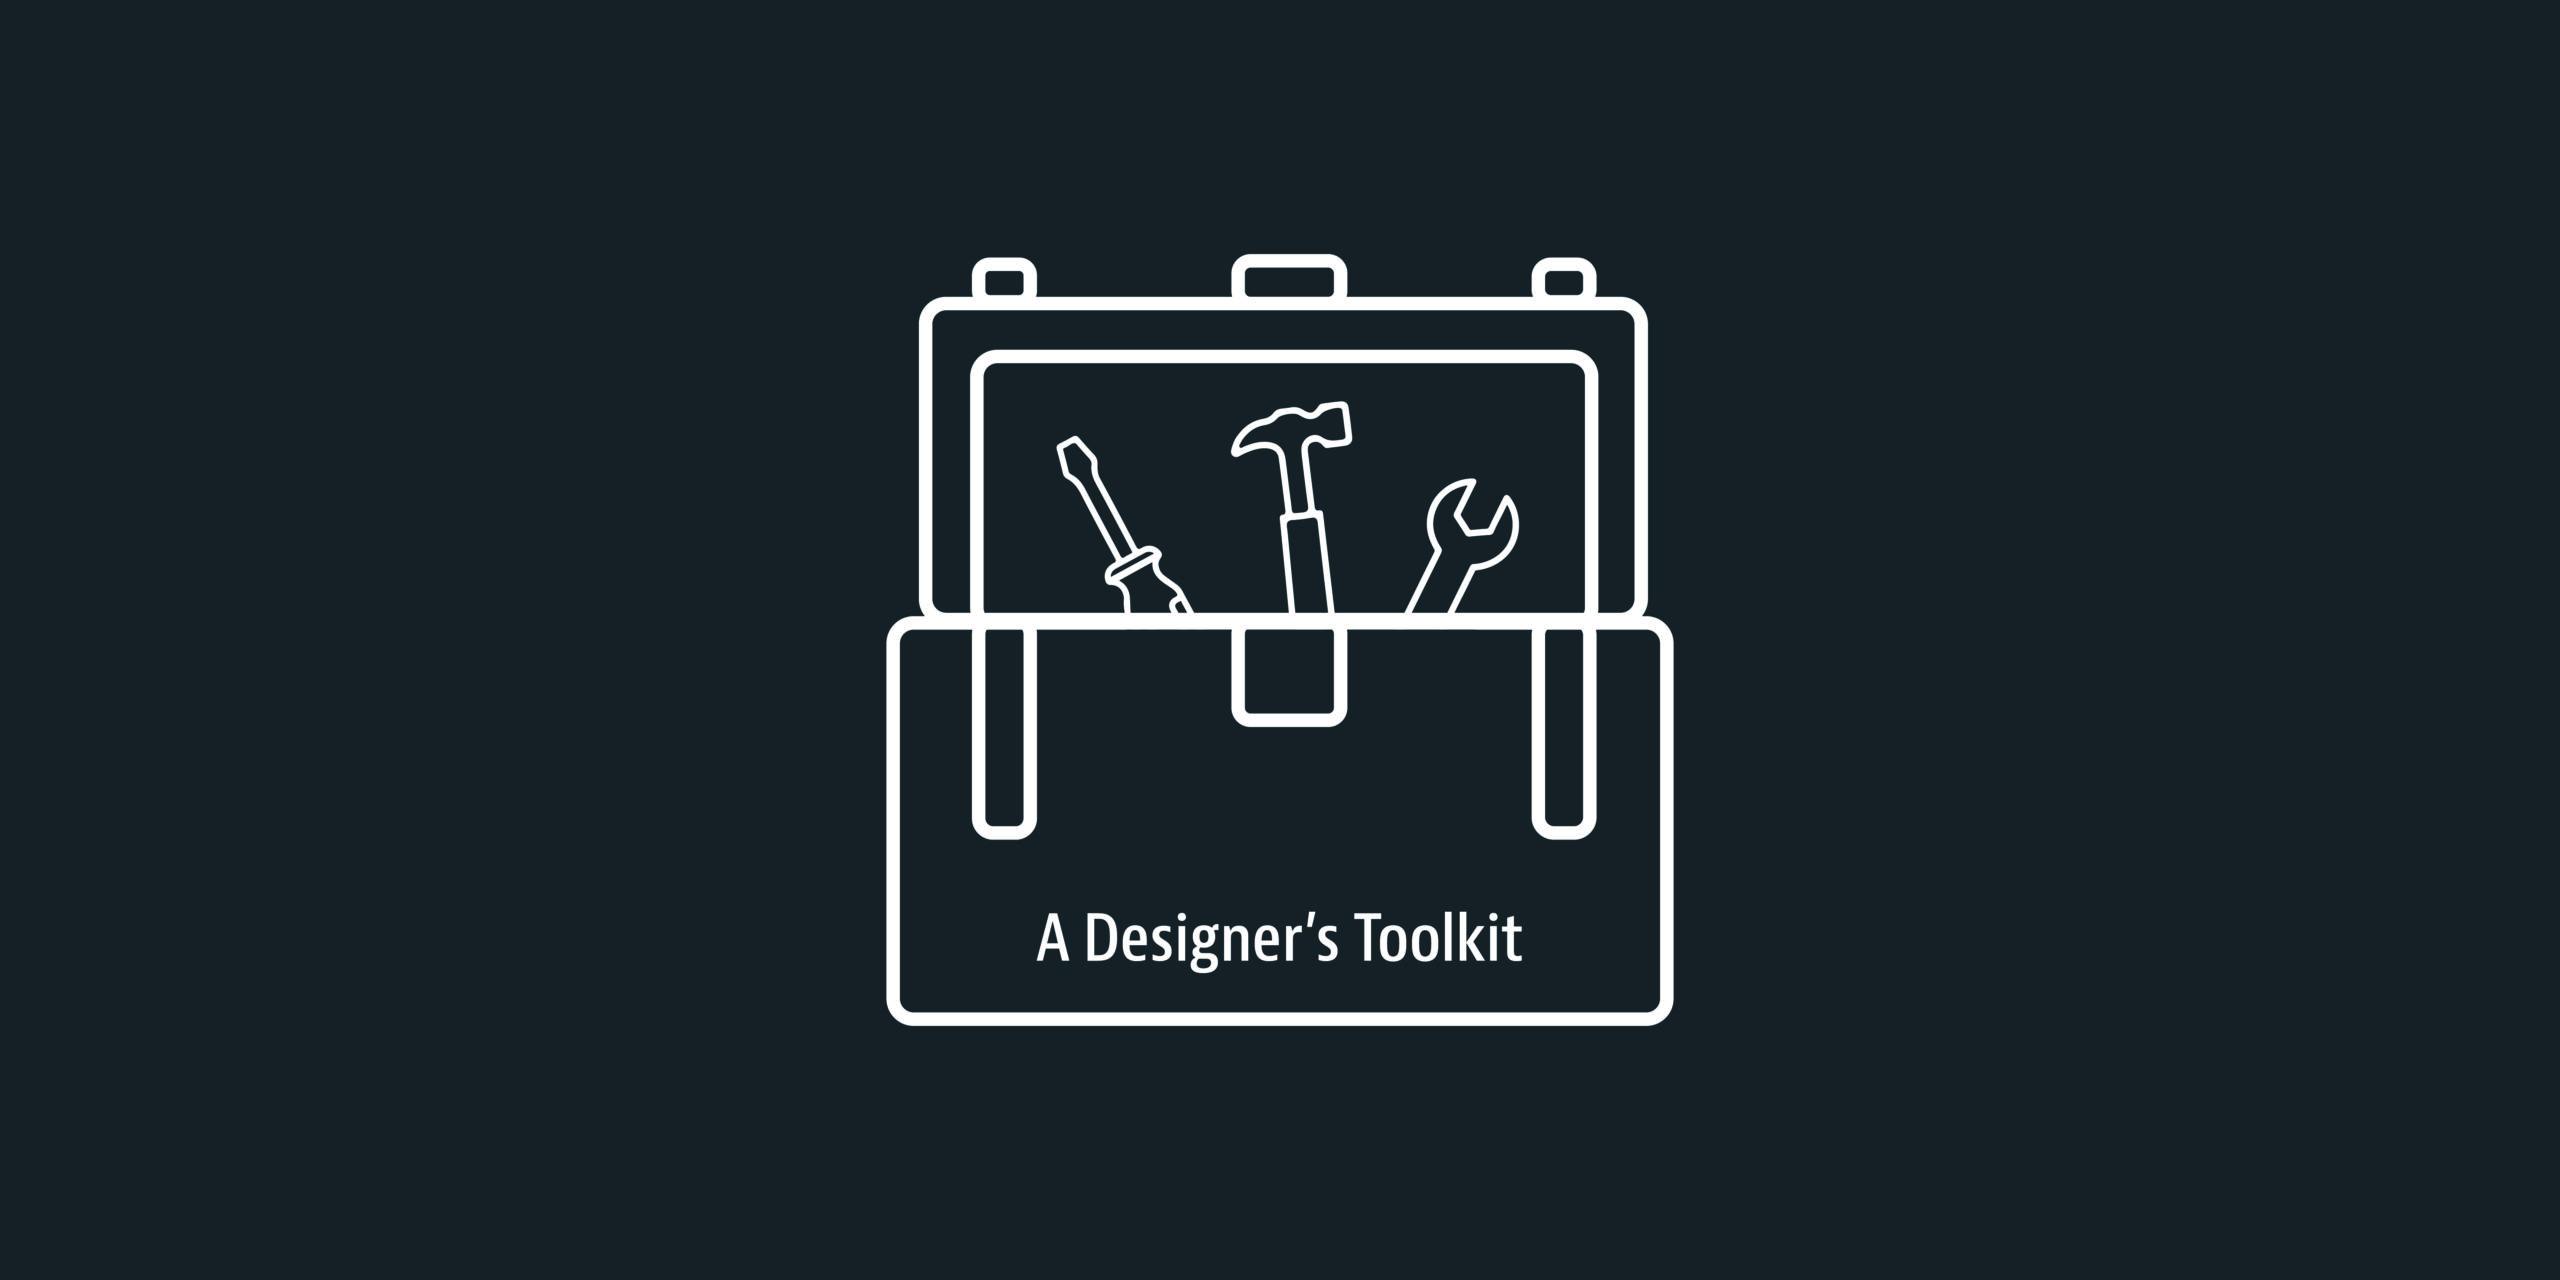 Designer Tool Kit Illustration - Tool kit Illustration - Grey Coffee Blog Post